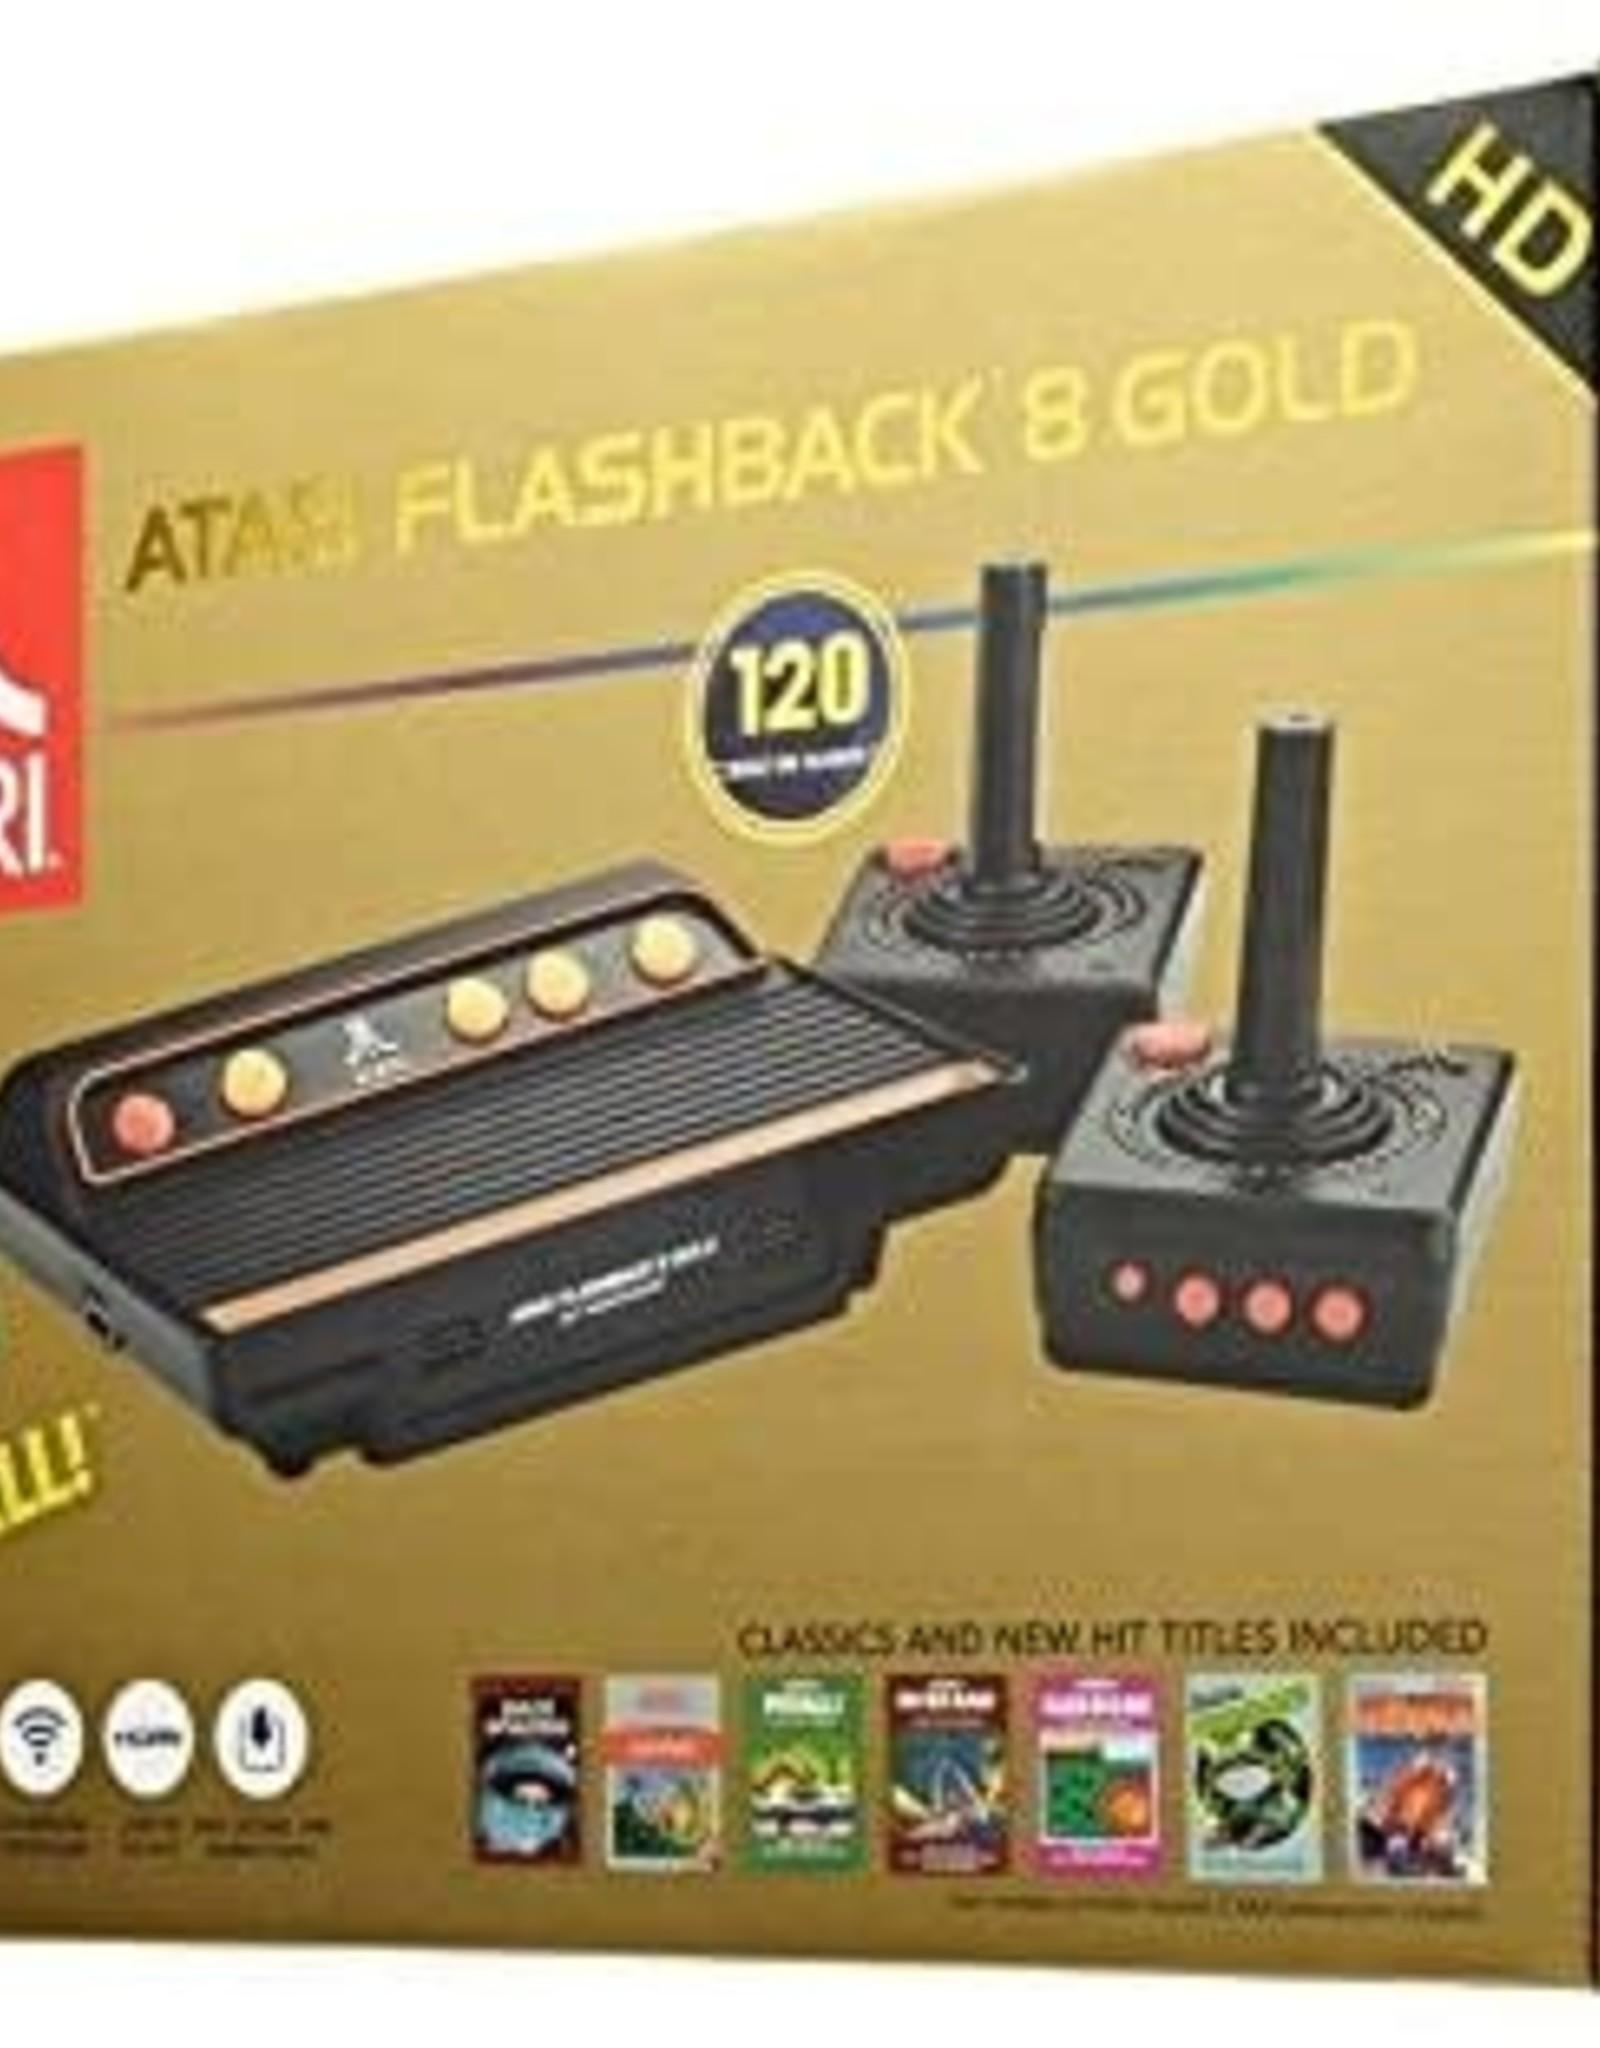 Atari 2600 Atari Flashback 8 Gold (USED)